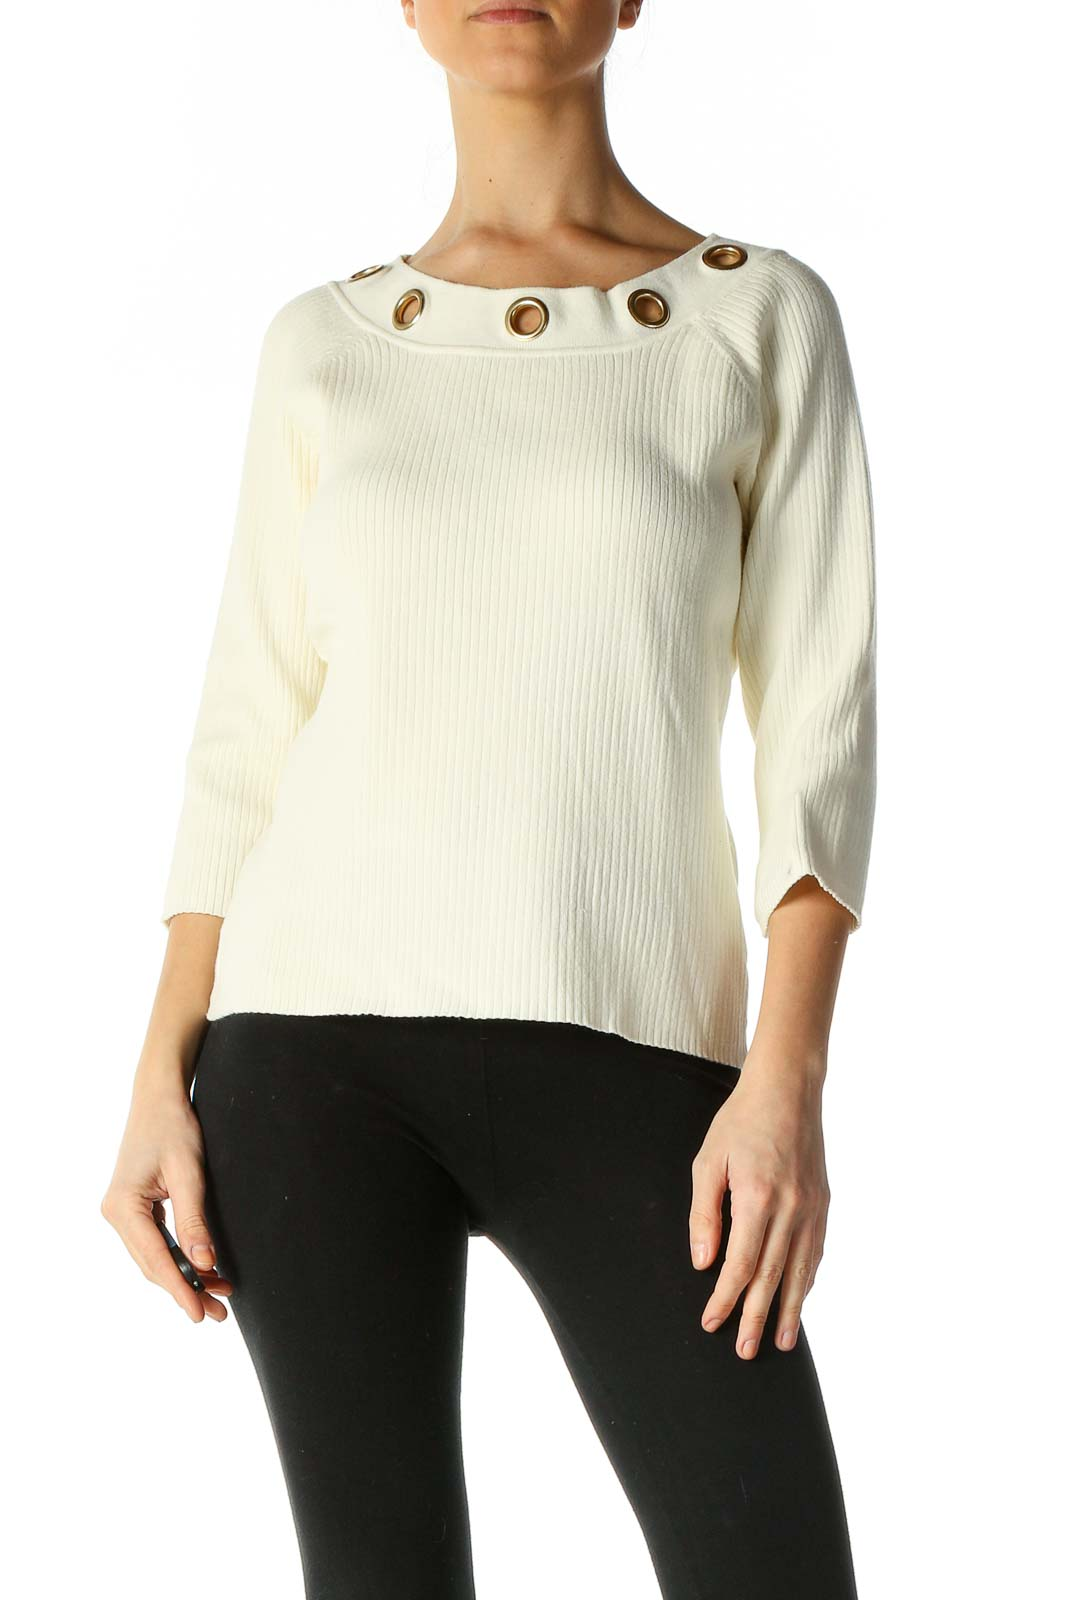 Beige Textured Retro Sweater Front